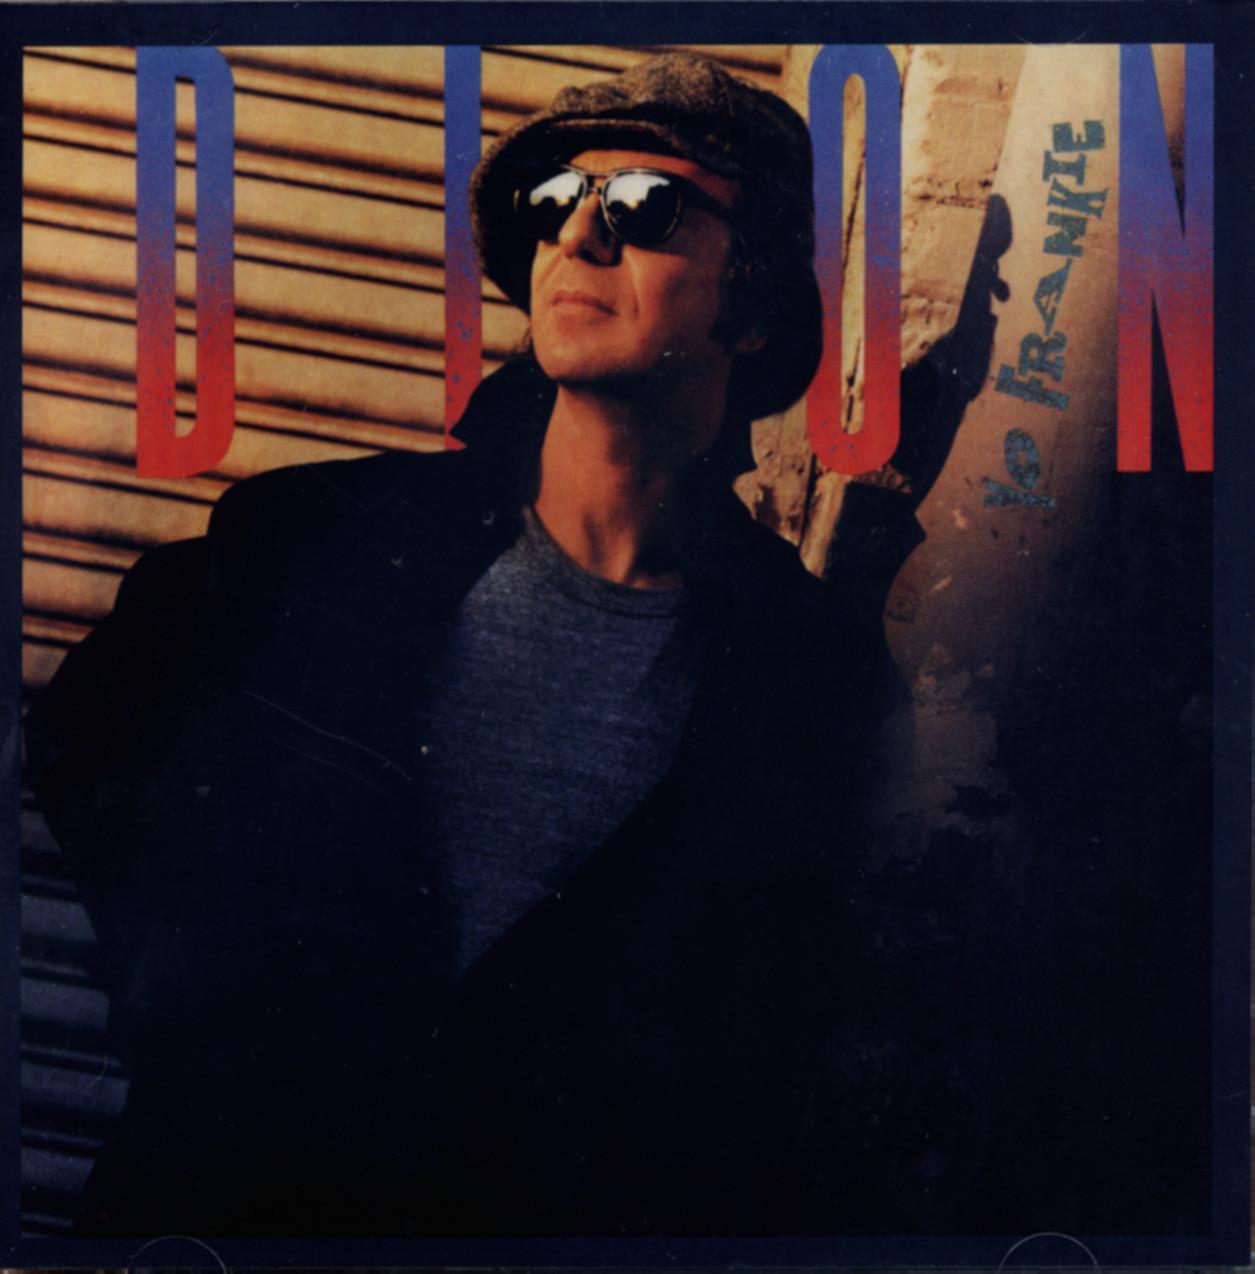 Dion - Yo Frankie (1989)